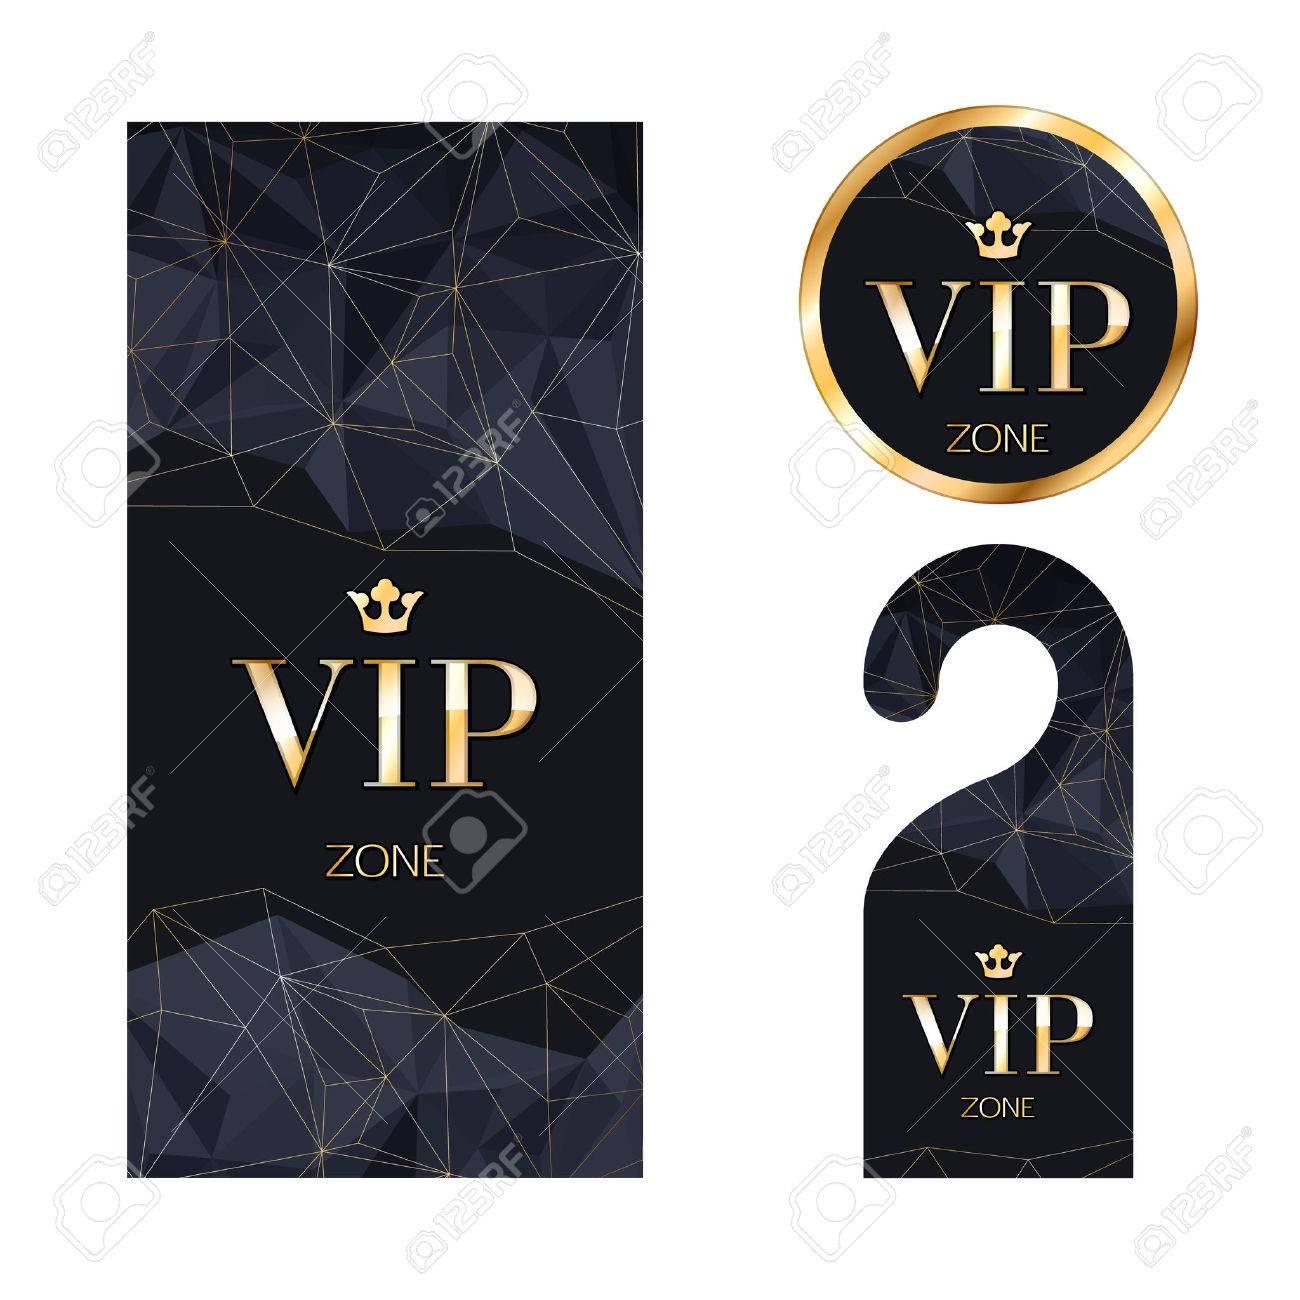 vip ゾーン メンバー プレミアム招待状カードは ハンガーと円形ラベル